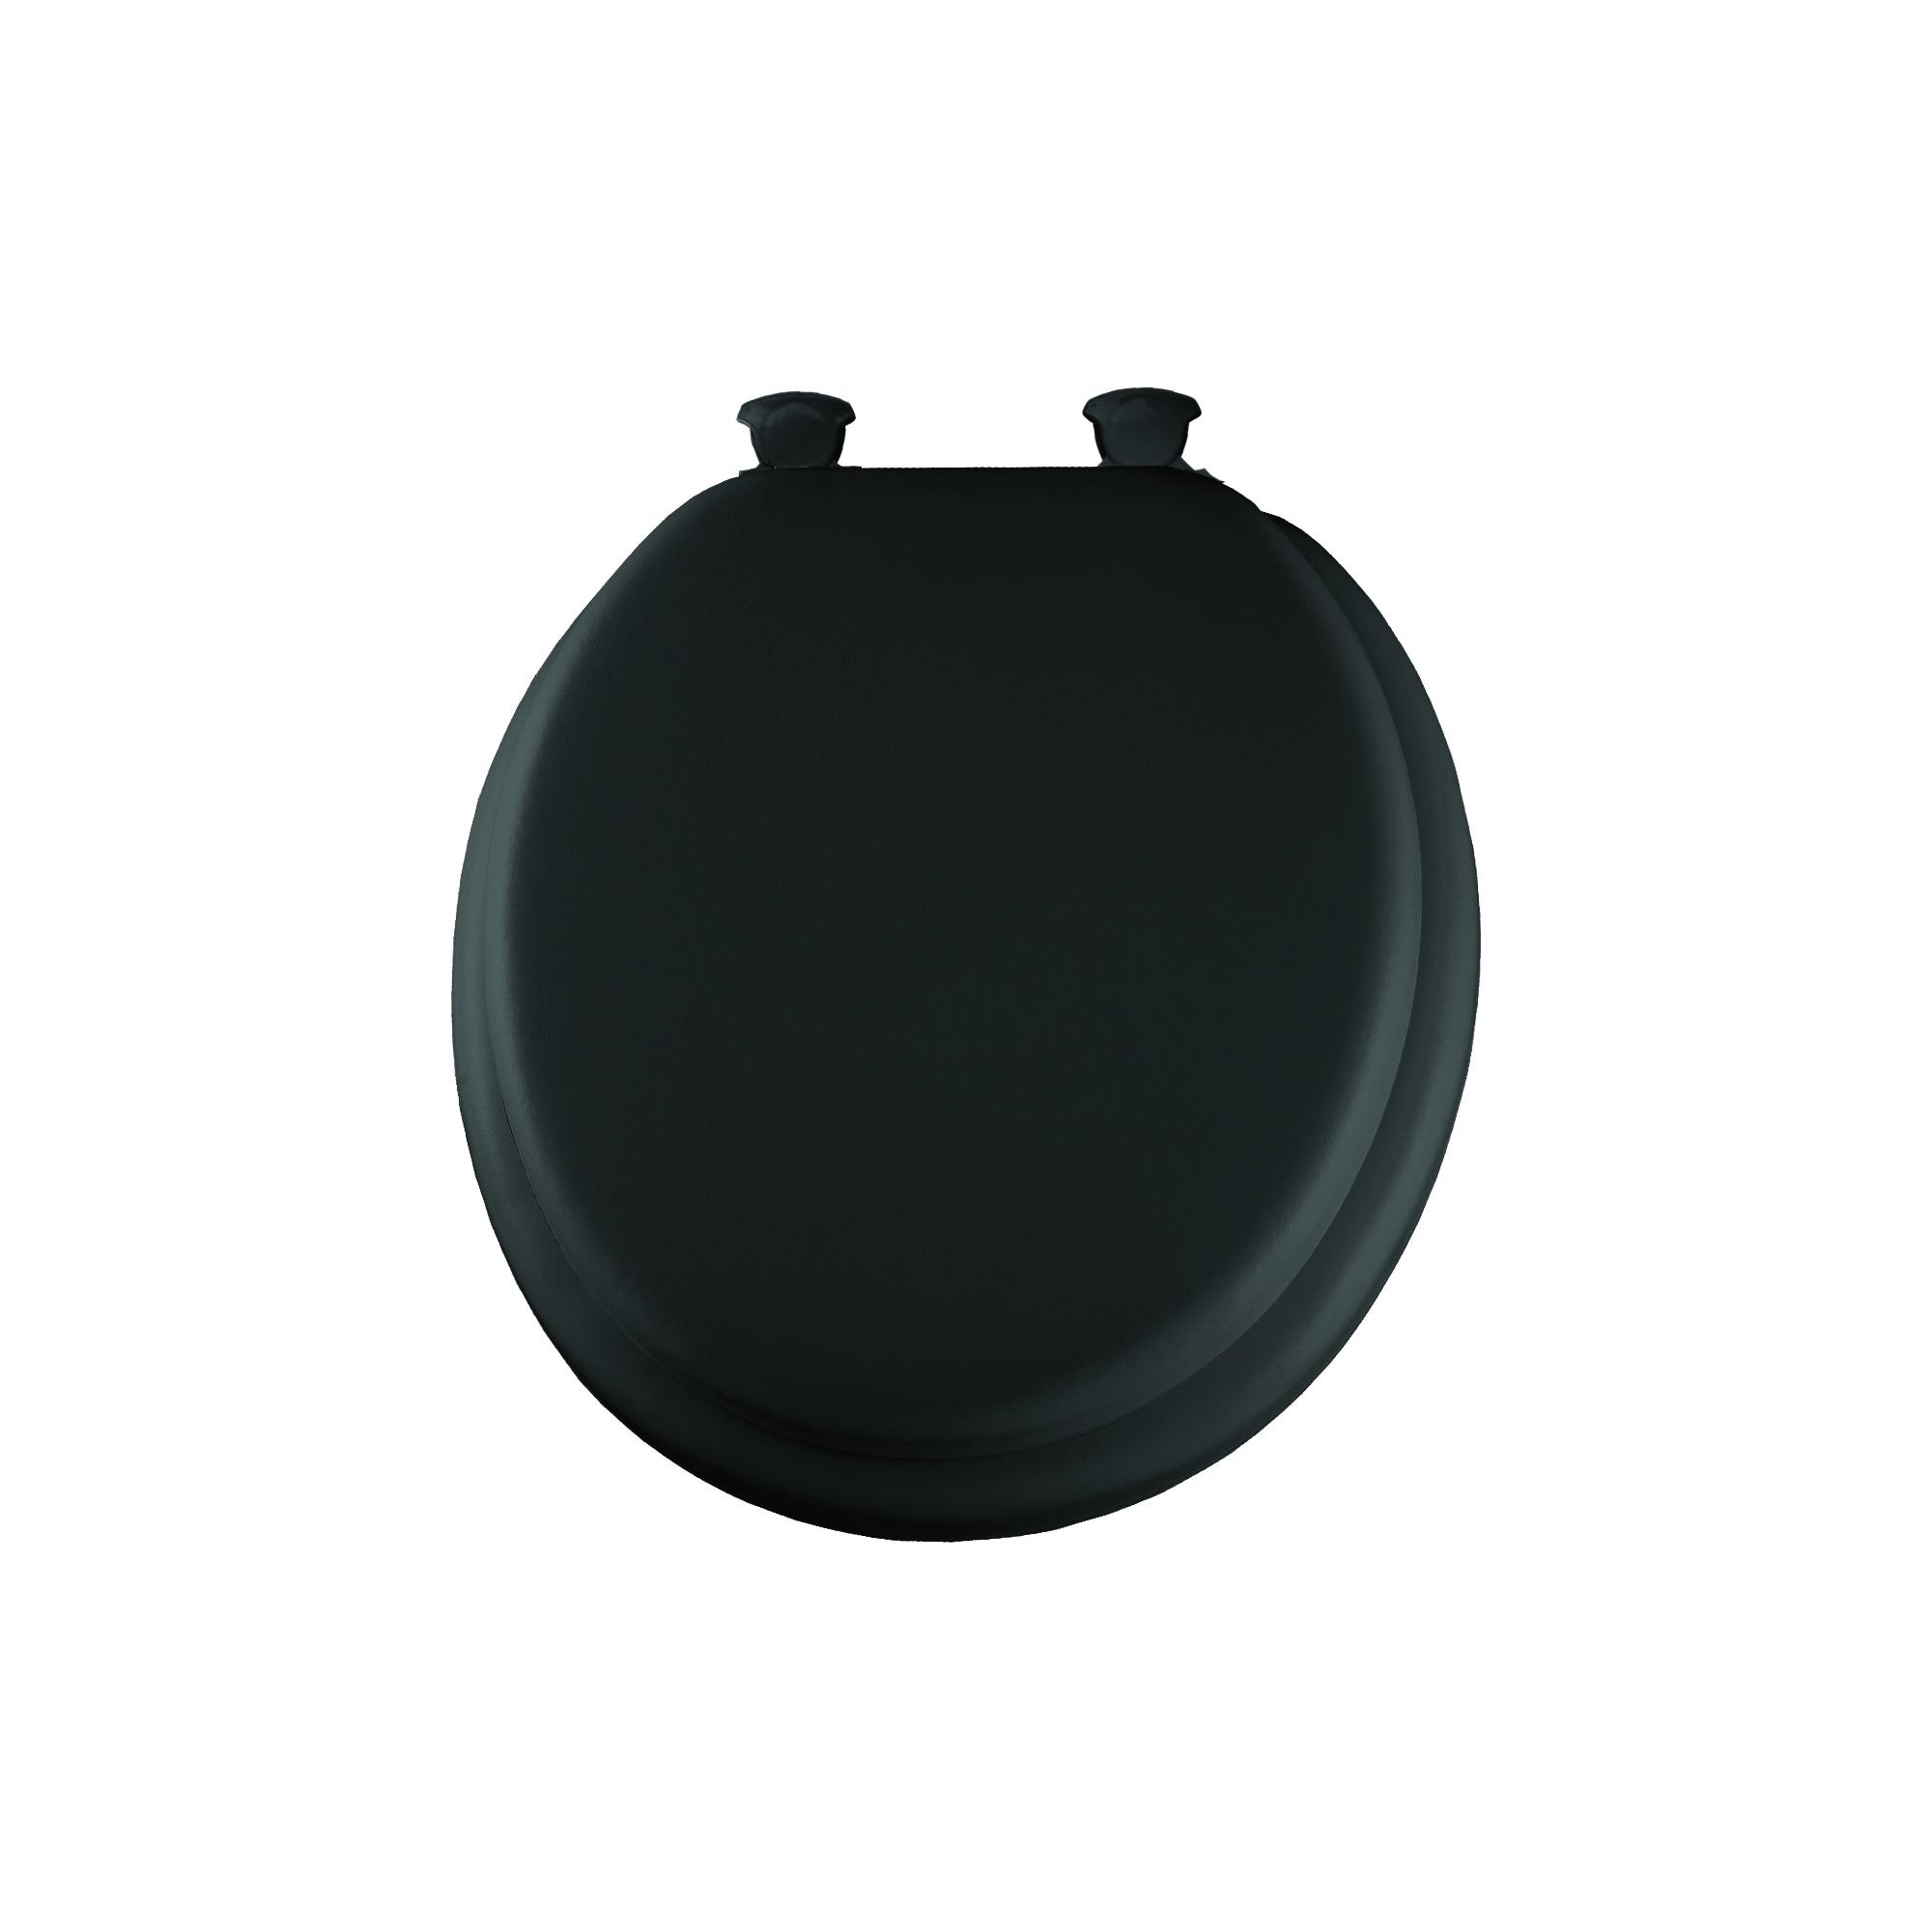 Mayfair® 13EC 047 Toilet Seat, Round Bowl, Closed Front, Wood, Easy Clean/Change® Hinge, Black